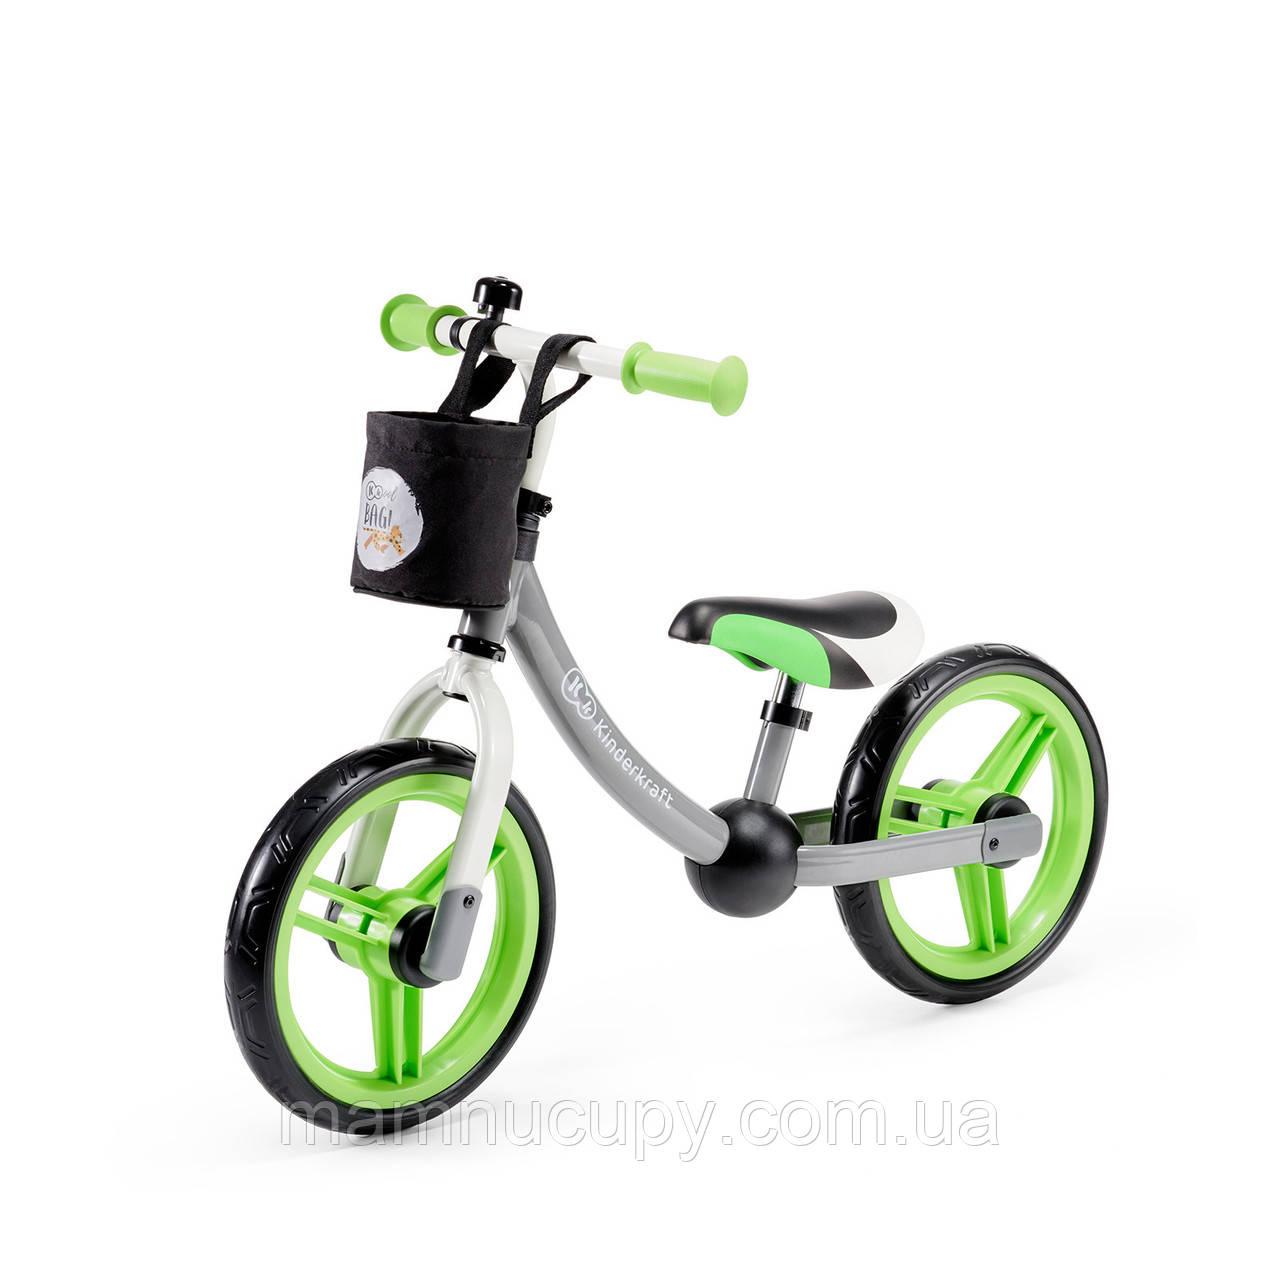 Дитячий беговел Kinderkraft 2Way Next Green/Gray (Киндеркрафт)